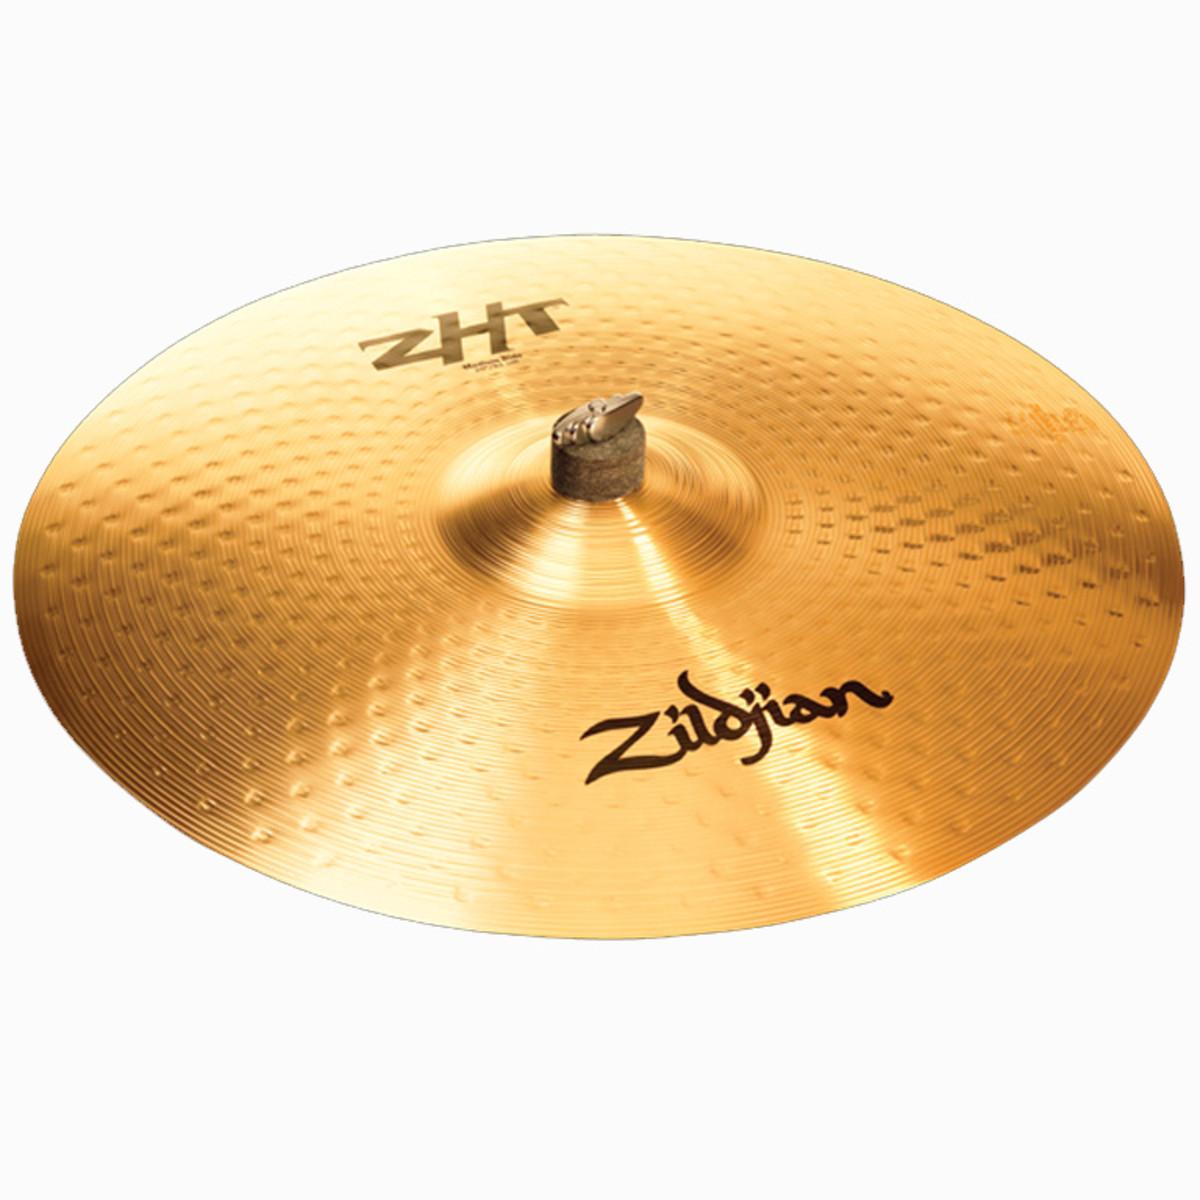 Largest Crash Cymbals : disc zildjian zht 20 crash ride cymbal at ~ Russianpoet.info Haus und Dekorationen